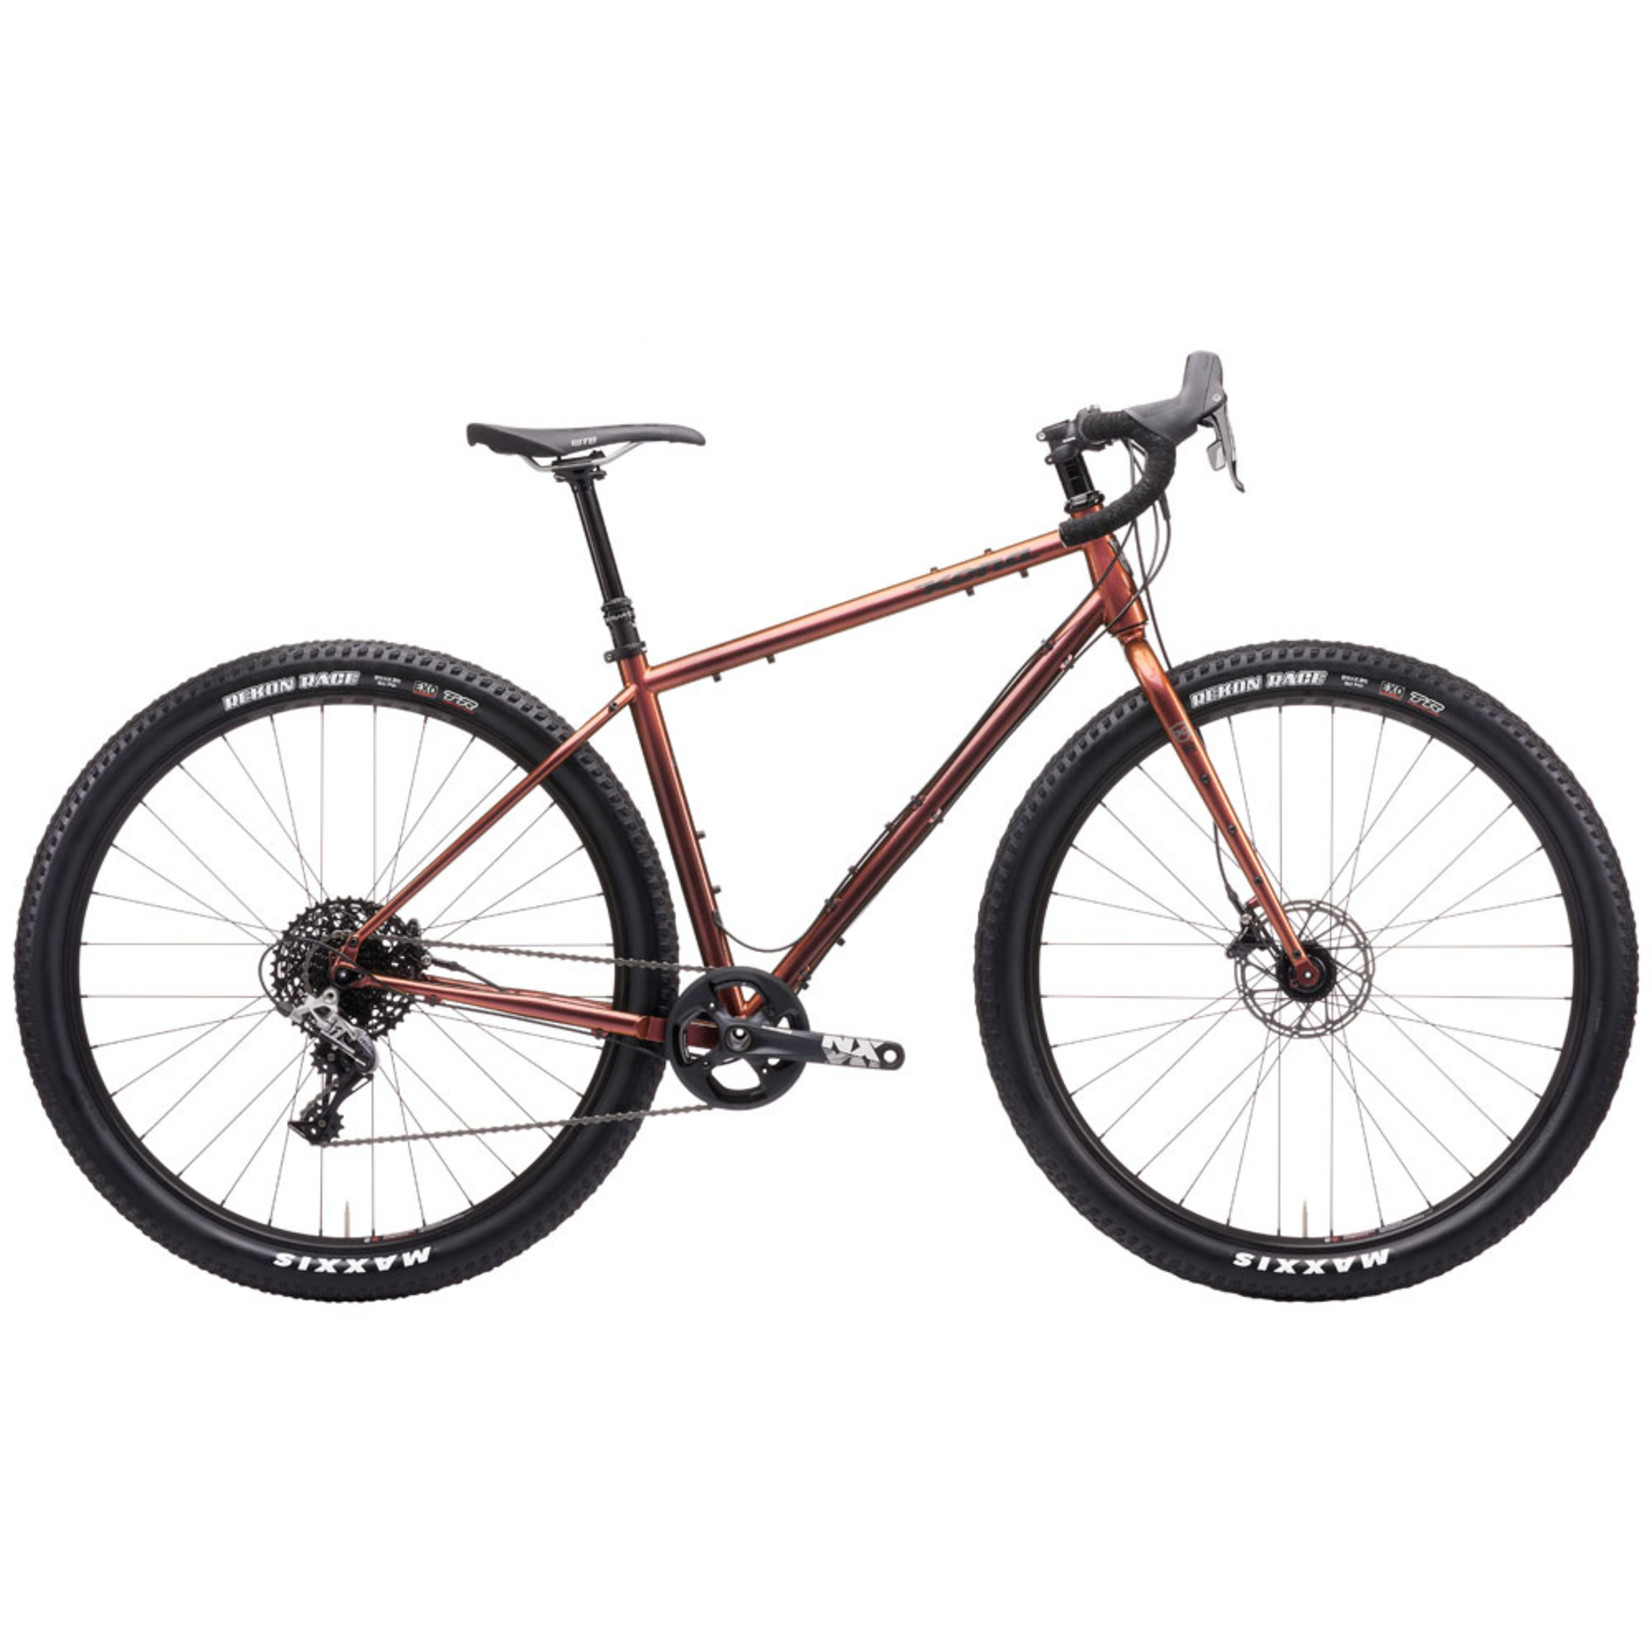 Kona Bikes 2021 Kona, Sutra ULTD